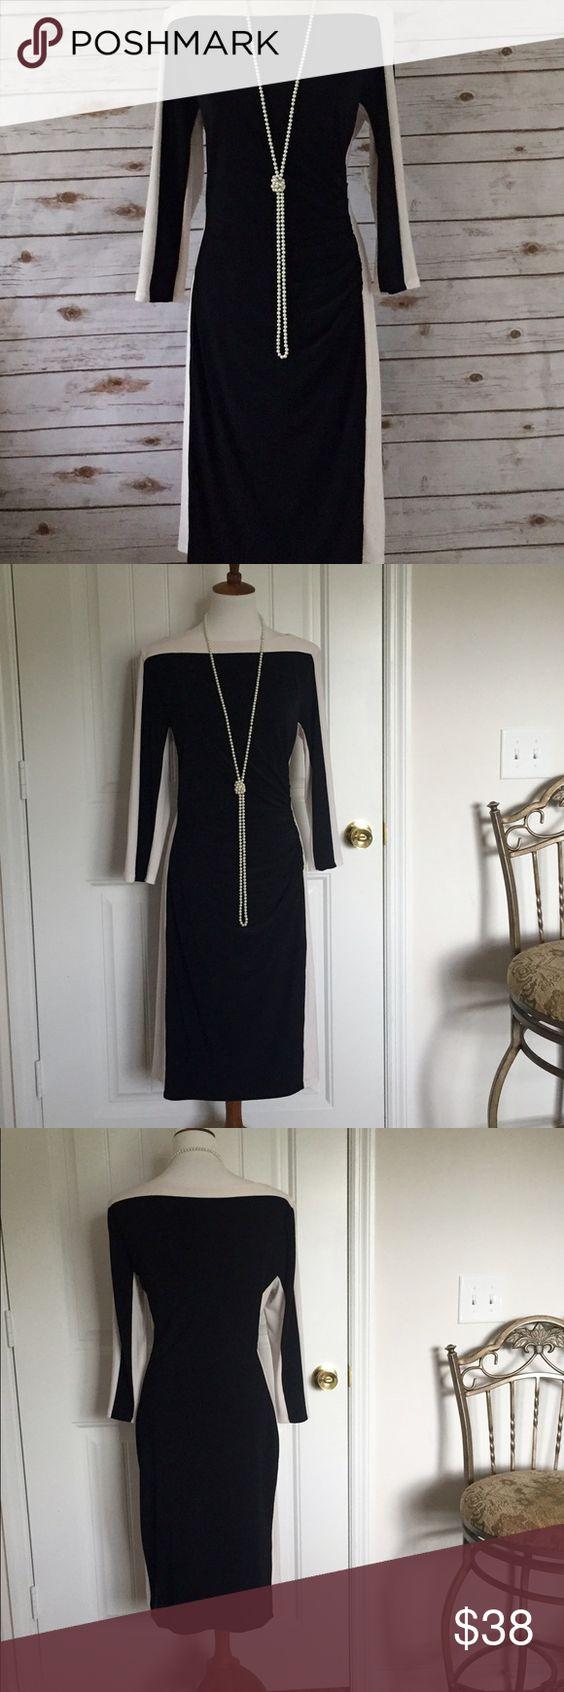 Ralph Lauren Block Dress Beautiful black & cream Ralph Lauren Block Dress.  Excellent condition - only worn once. size 14 Ralph Lauren Dresses